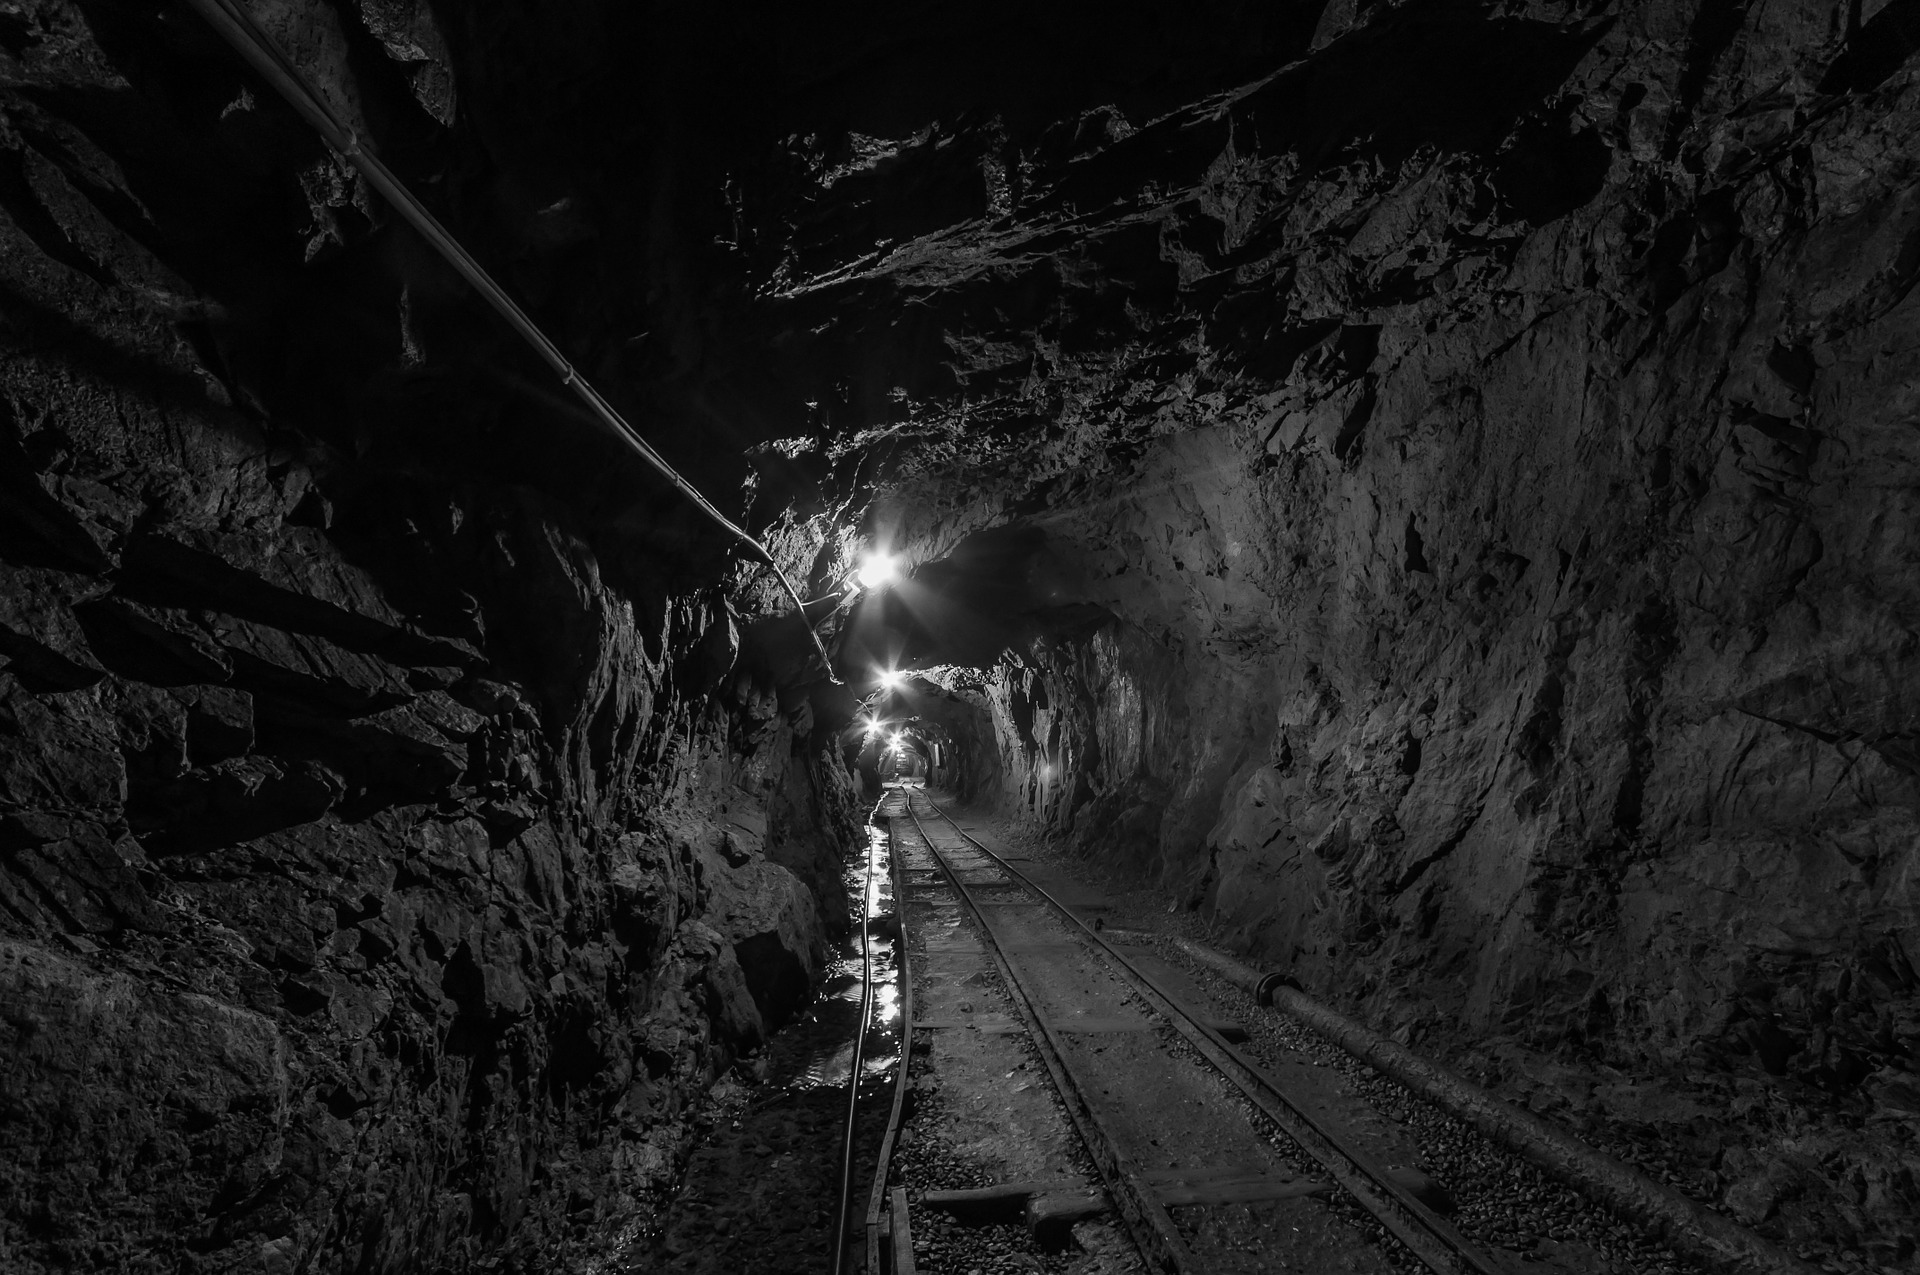 tunnel-957963_1920